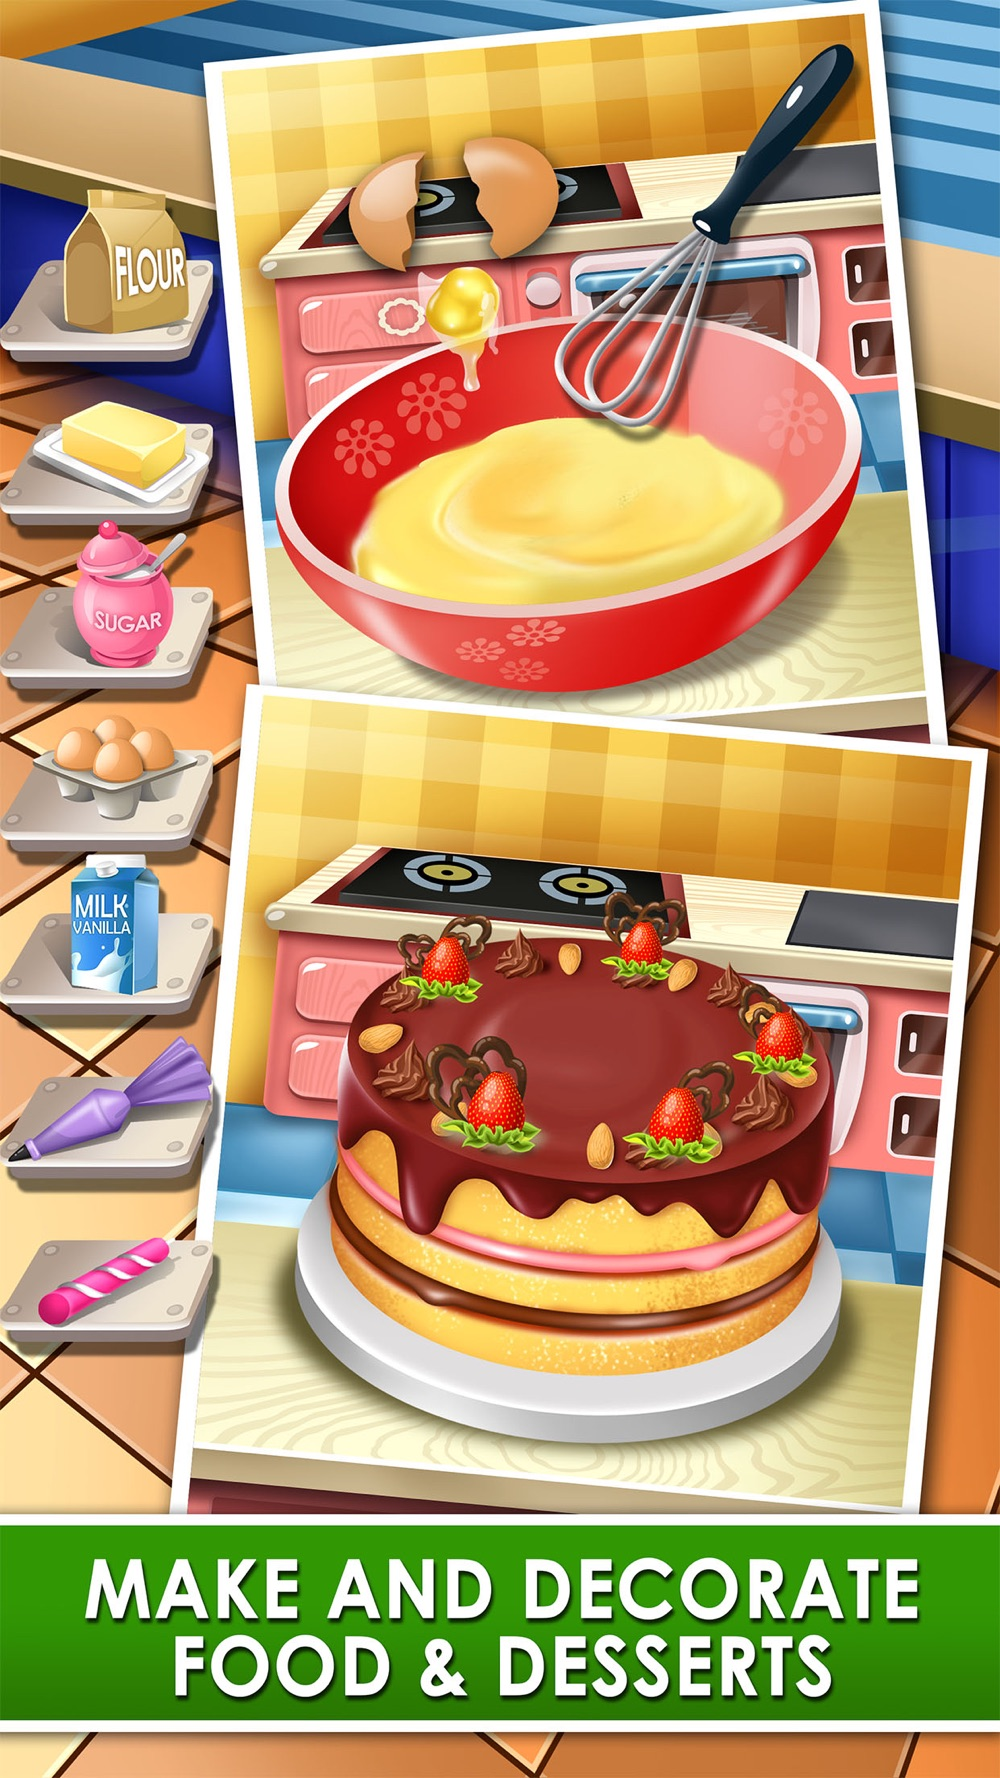 Food Making Kids Games & Maker Cooking hack tool